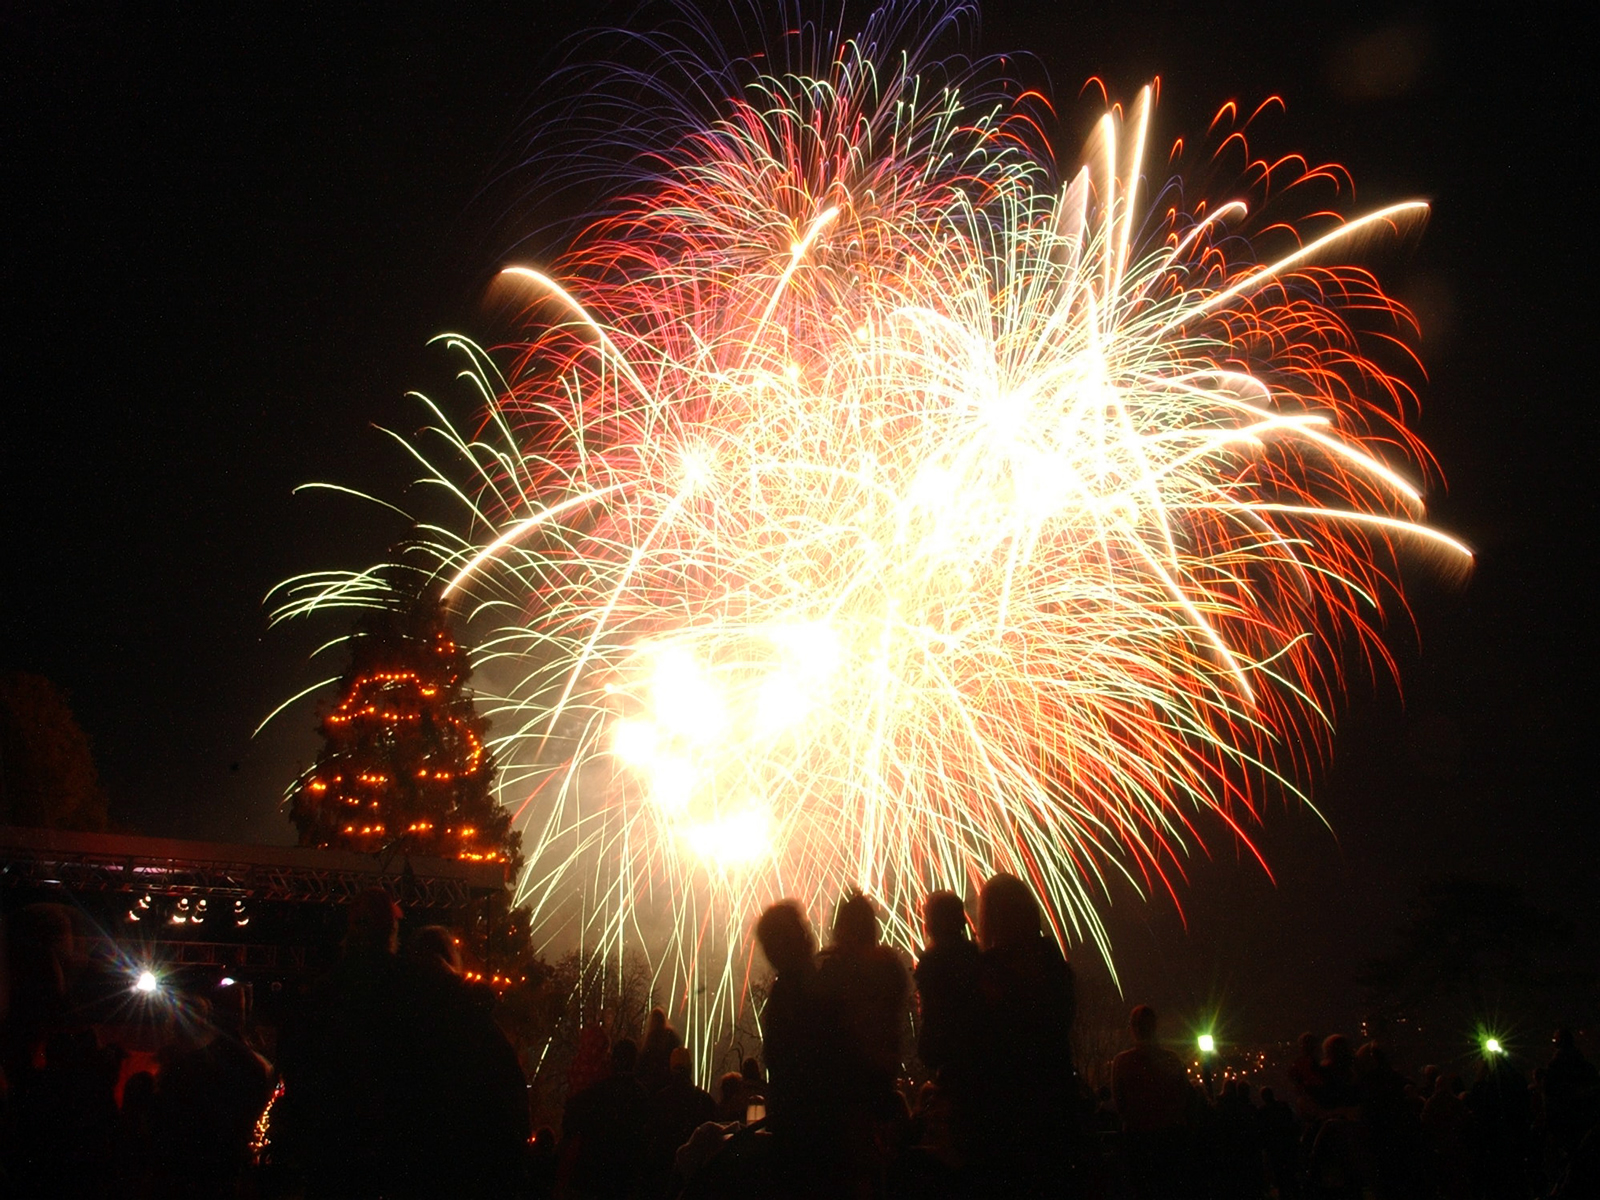 2014 Niagara Falls New Year's Eve Celebration